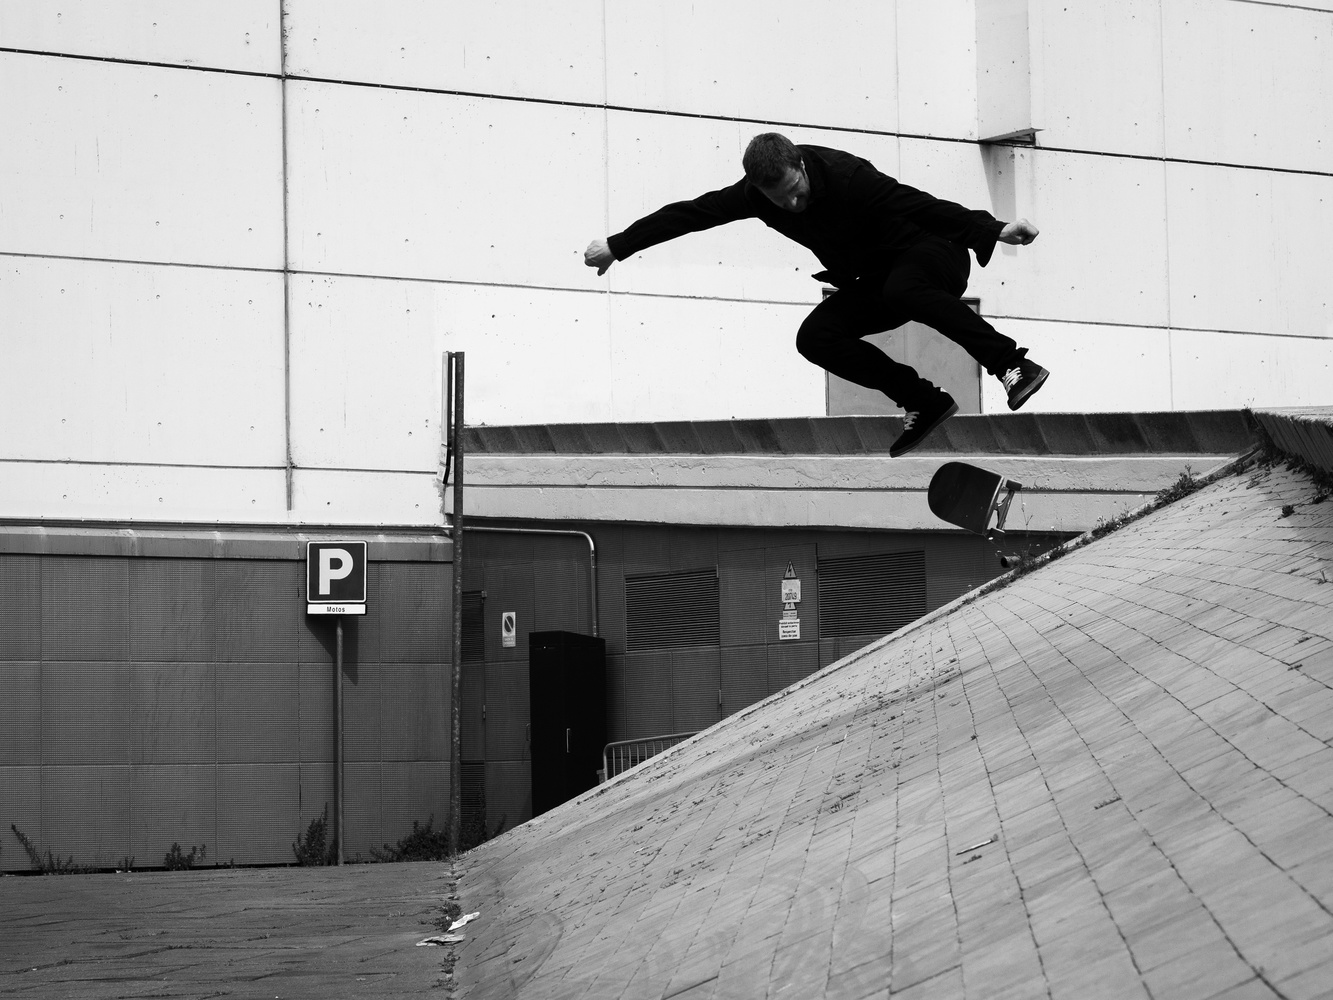 Backside flip by Thomas Wragg